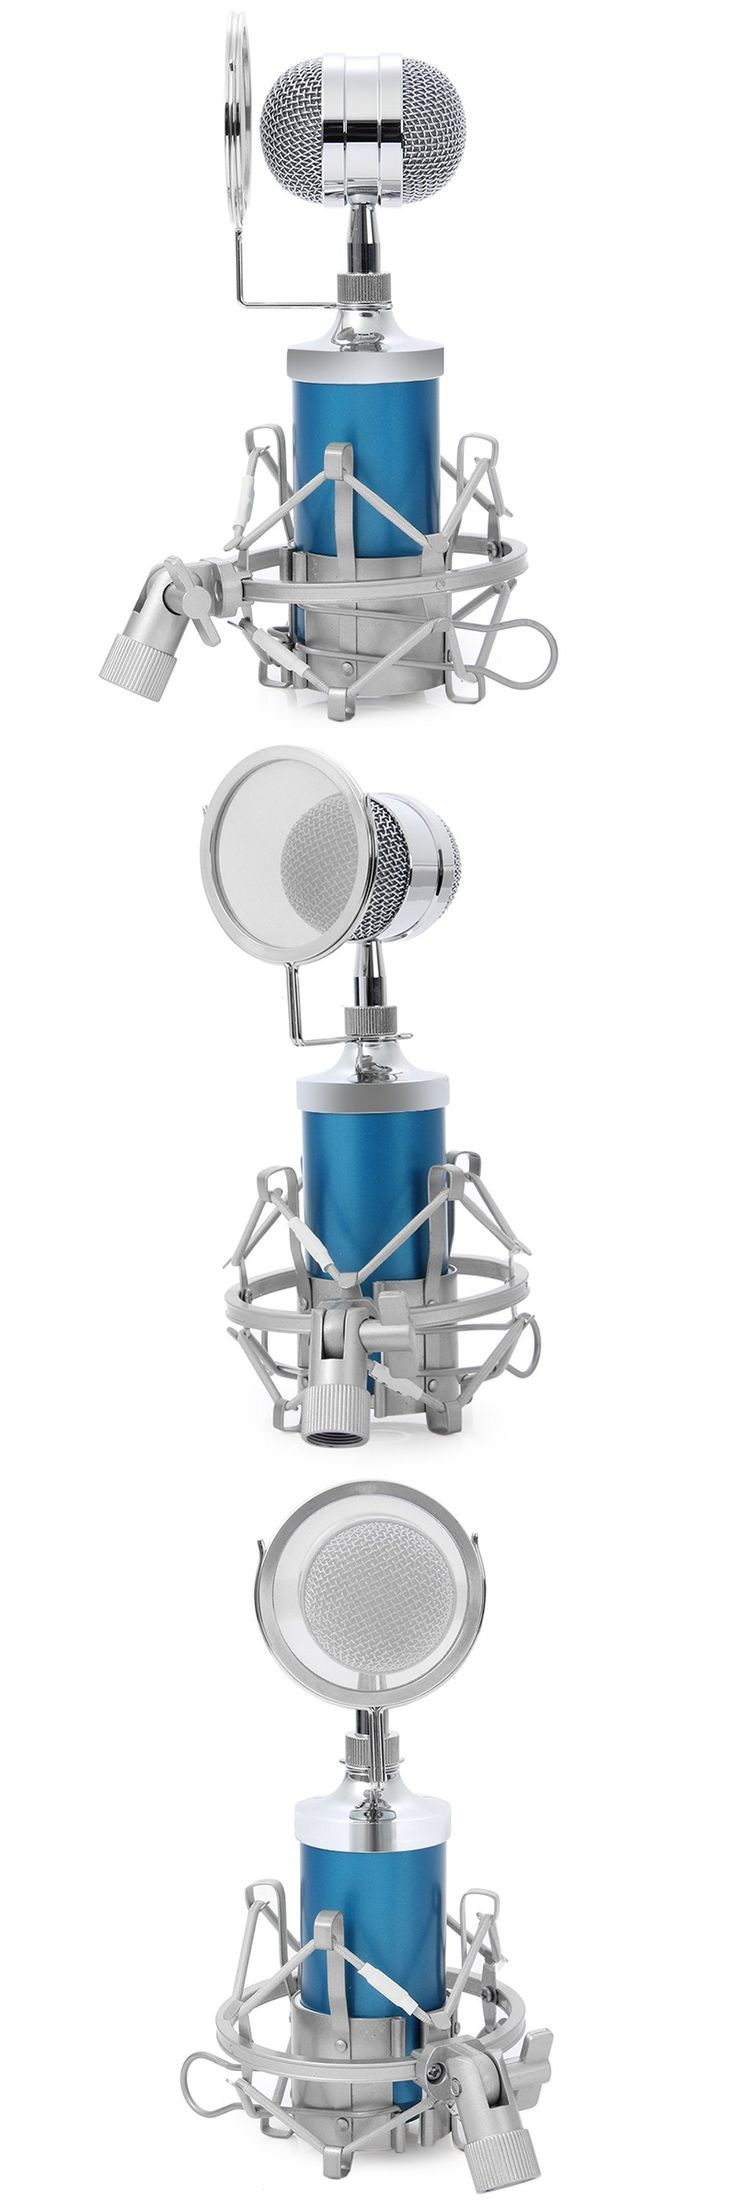 for KTV Karaoke BM-8000 Sound Studio Recording Condenser Wired Microphone With 3.5mm Plug Stand Holder Pop Filter Blue